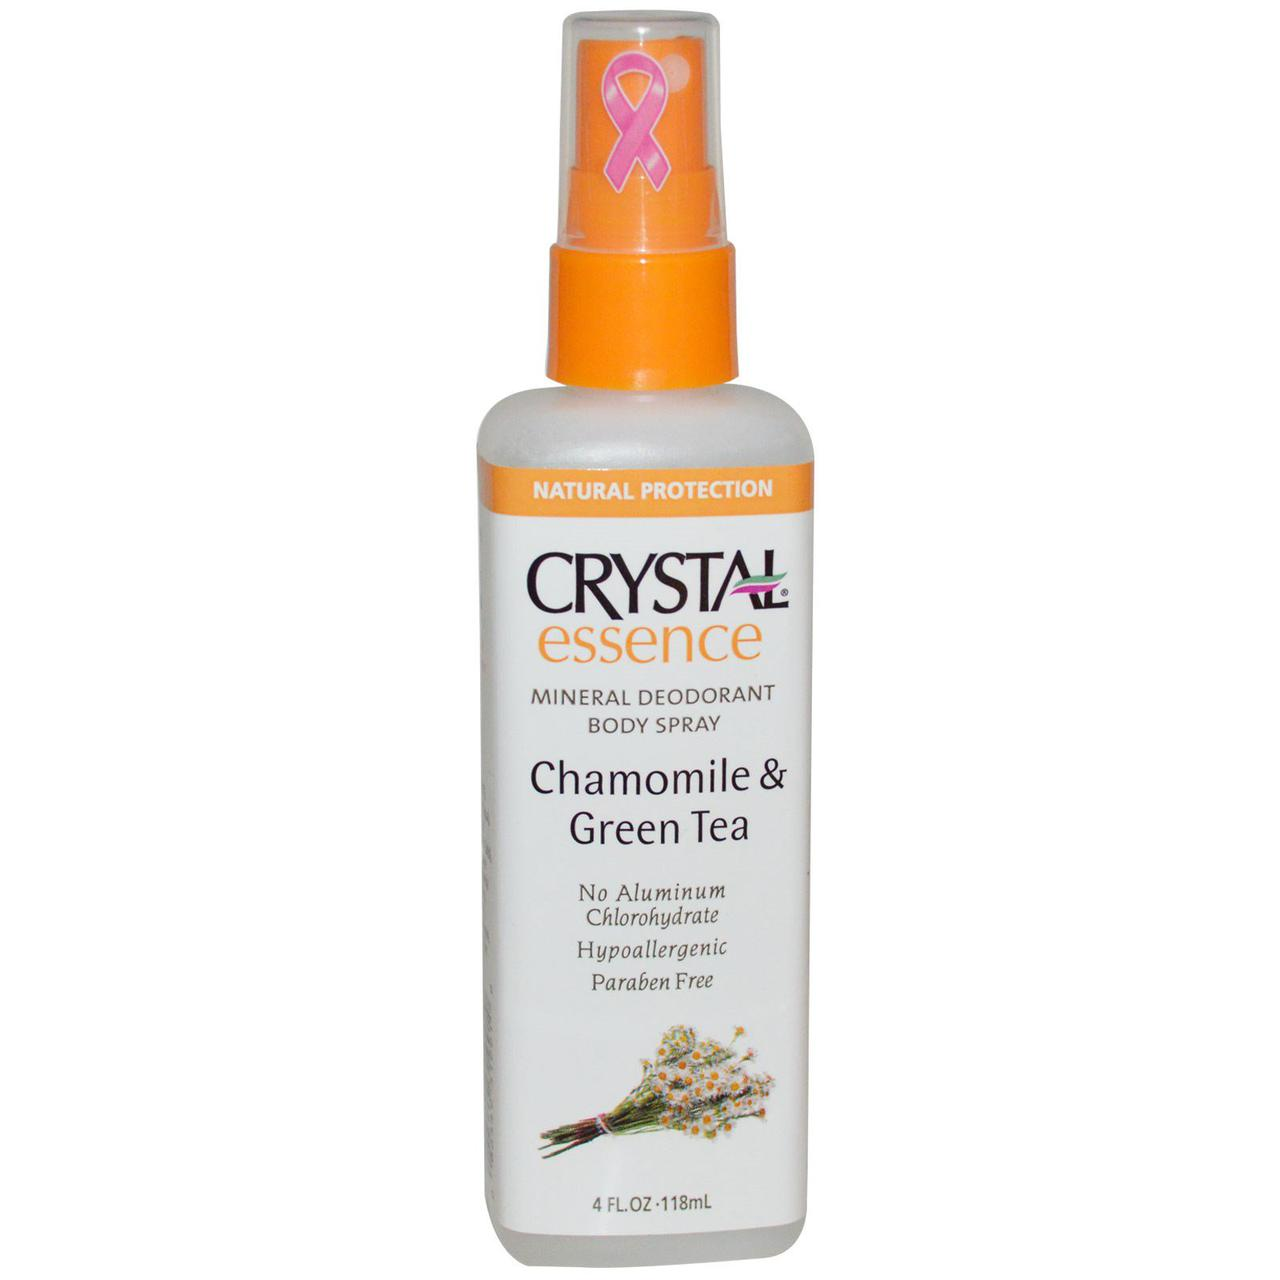 Crystal Essence Deodorant Chamomile & Green Tea Spray Роликовый дезодорант(ромашка и зел.чай)118мл